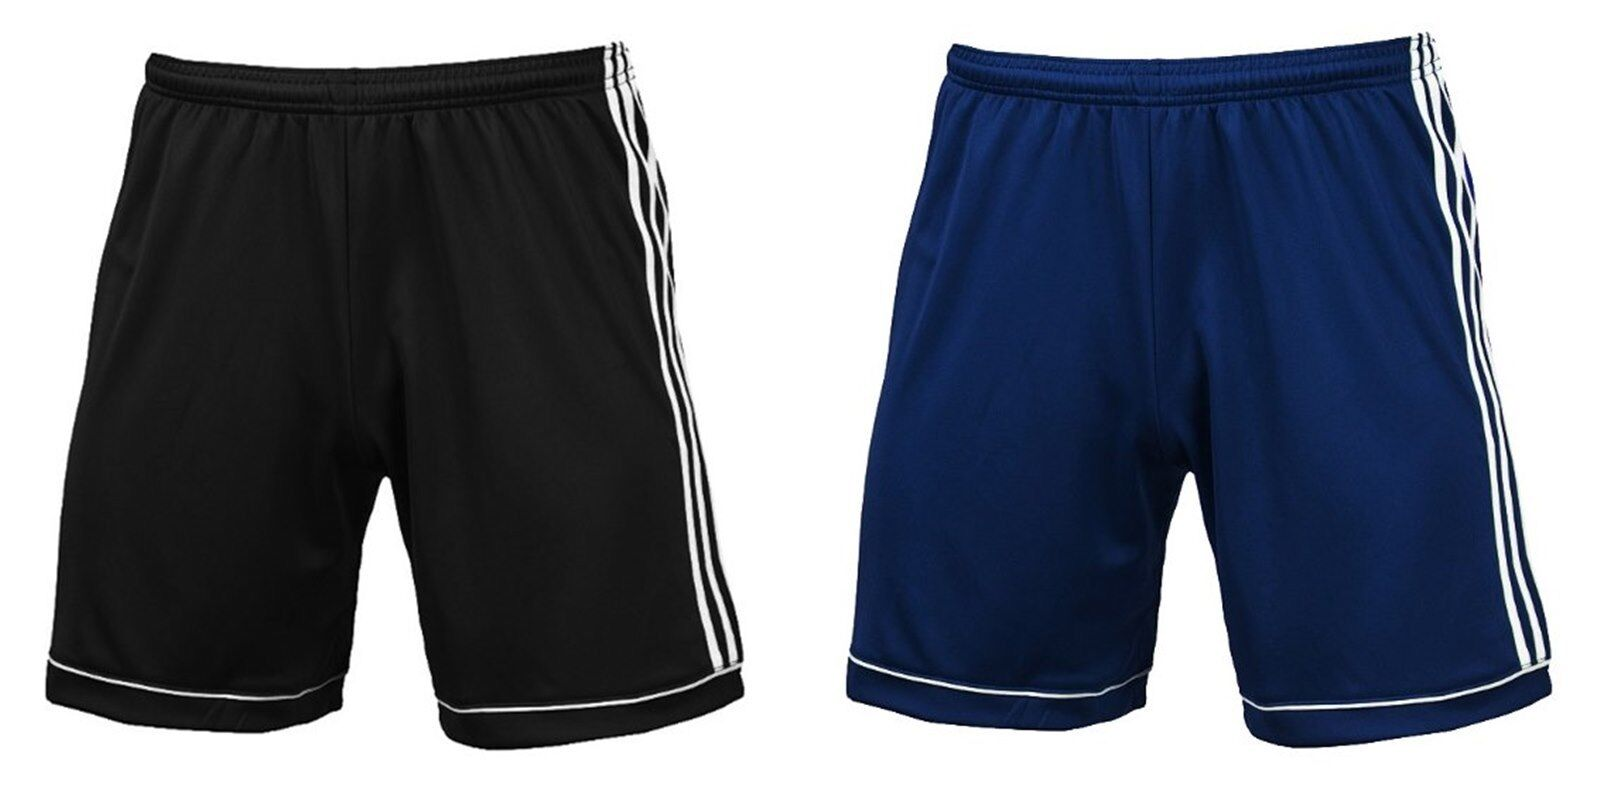 Adidas Men's Extreme Workout Black Grey Training Pants